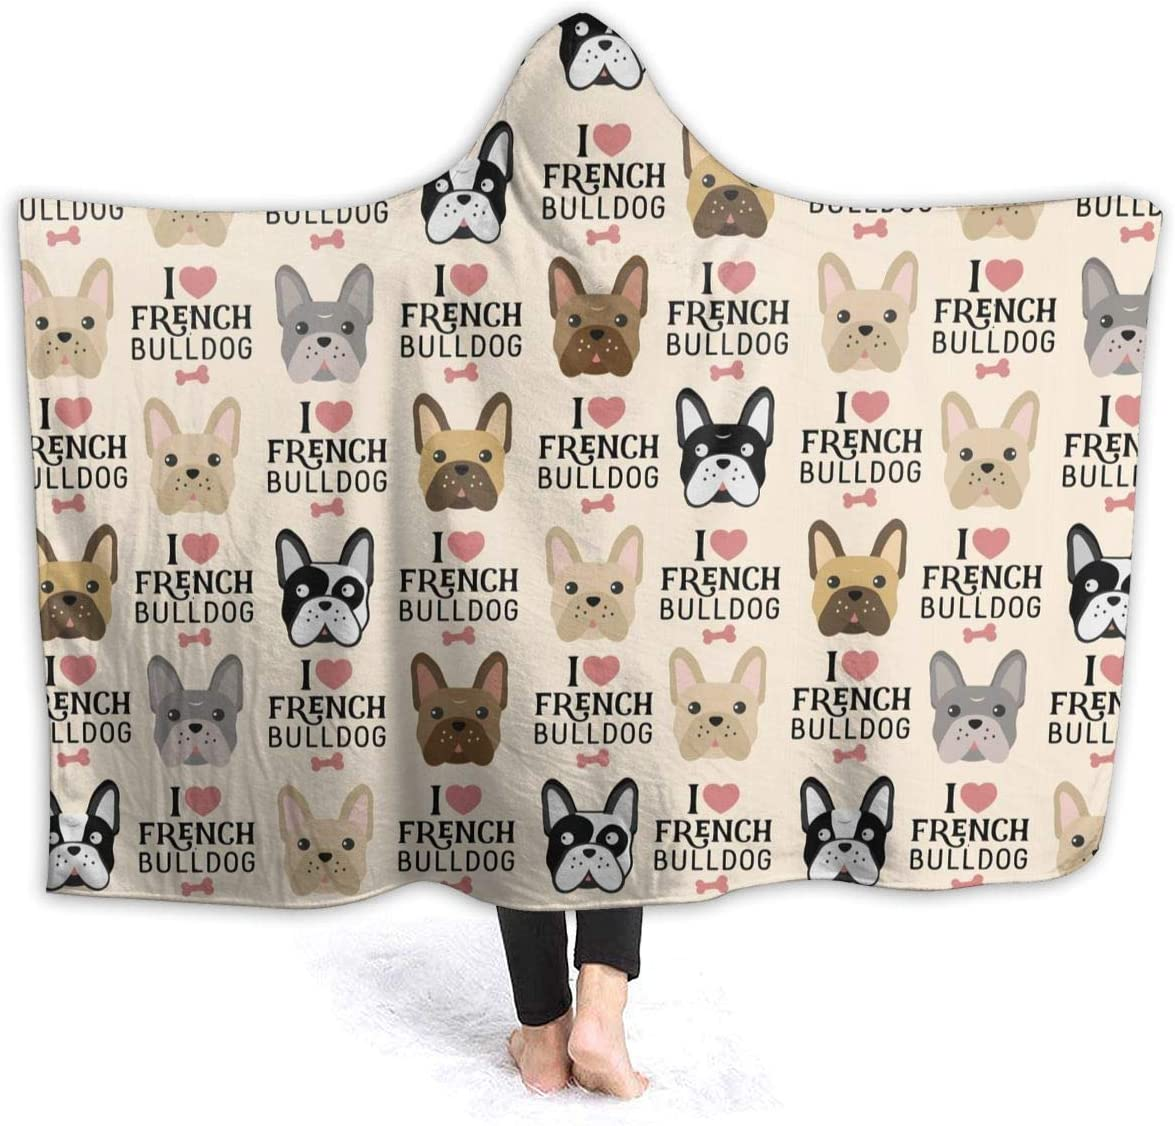 JASMODER 別倉庫からの配送 I Love French 毎日激安特売で 営業中です Bulldog Throw Bla Hoodie Wearable Blanket